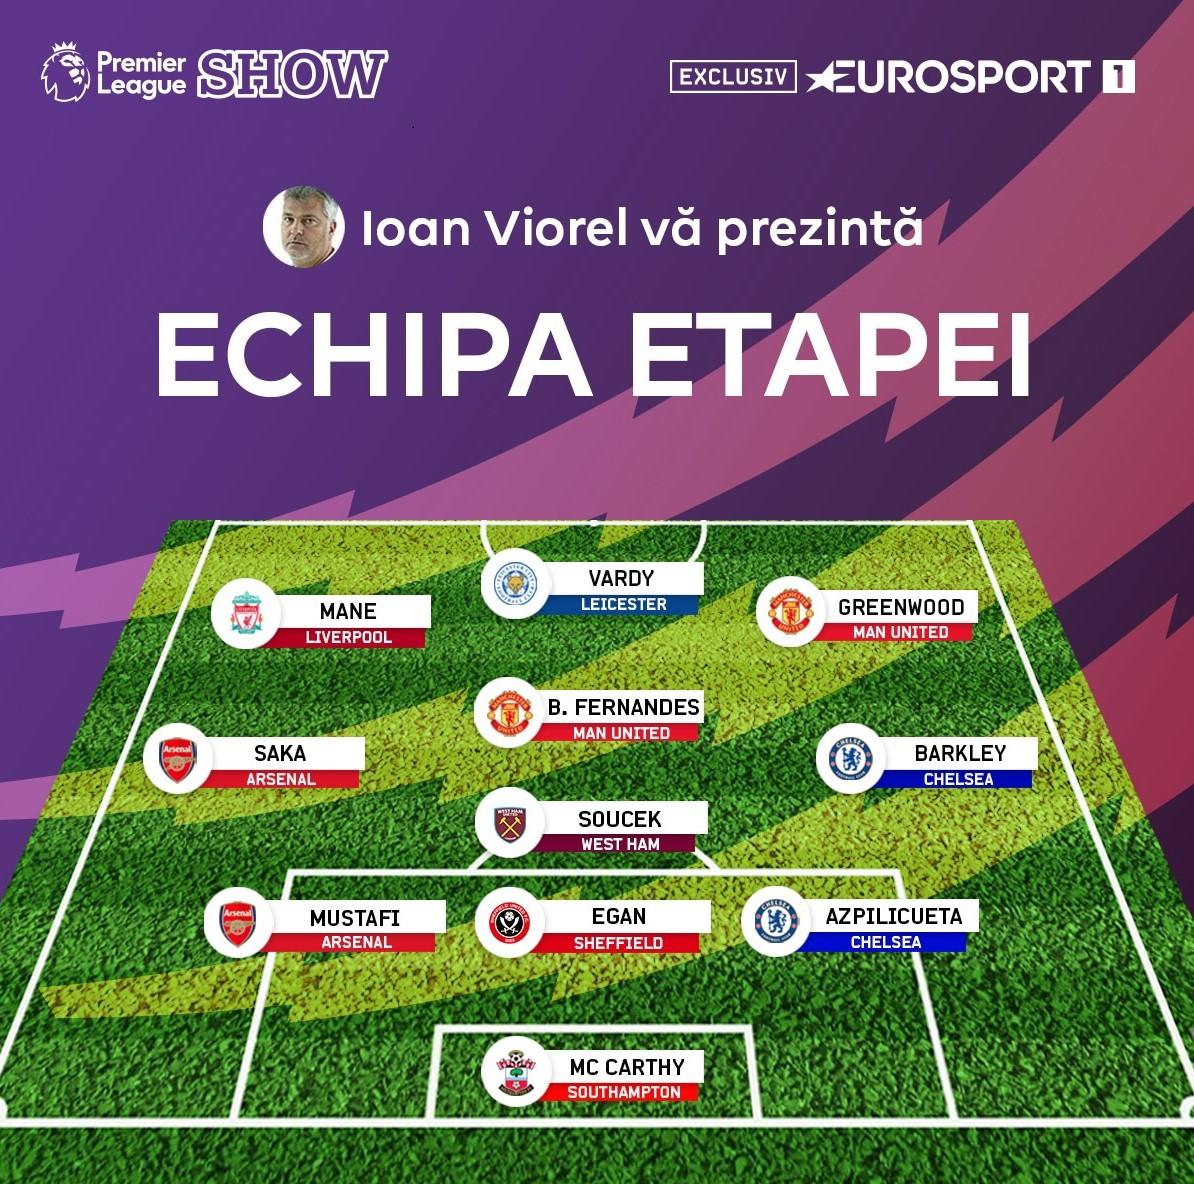 https://i.eurosport.com/2020/07/07/2846263.png